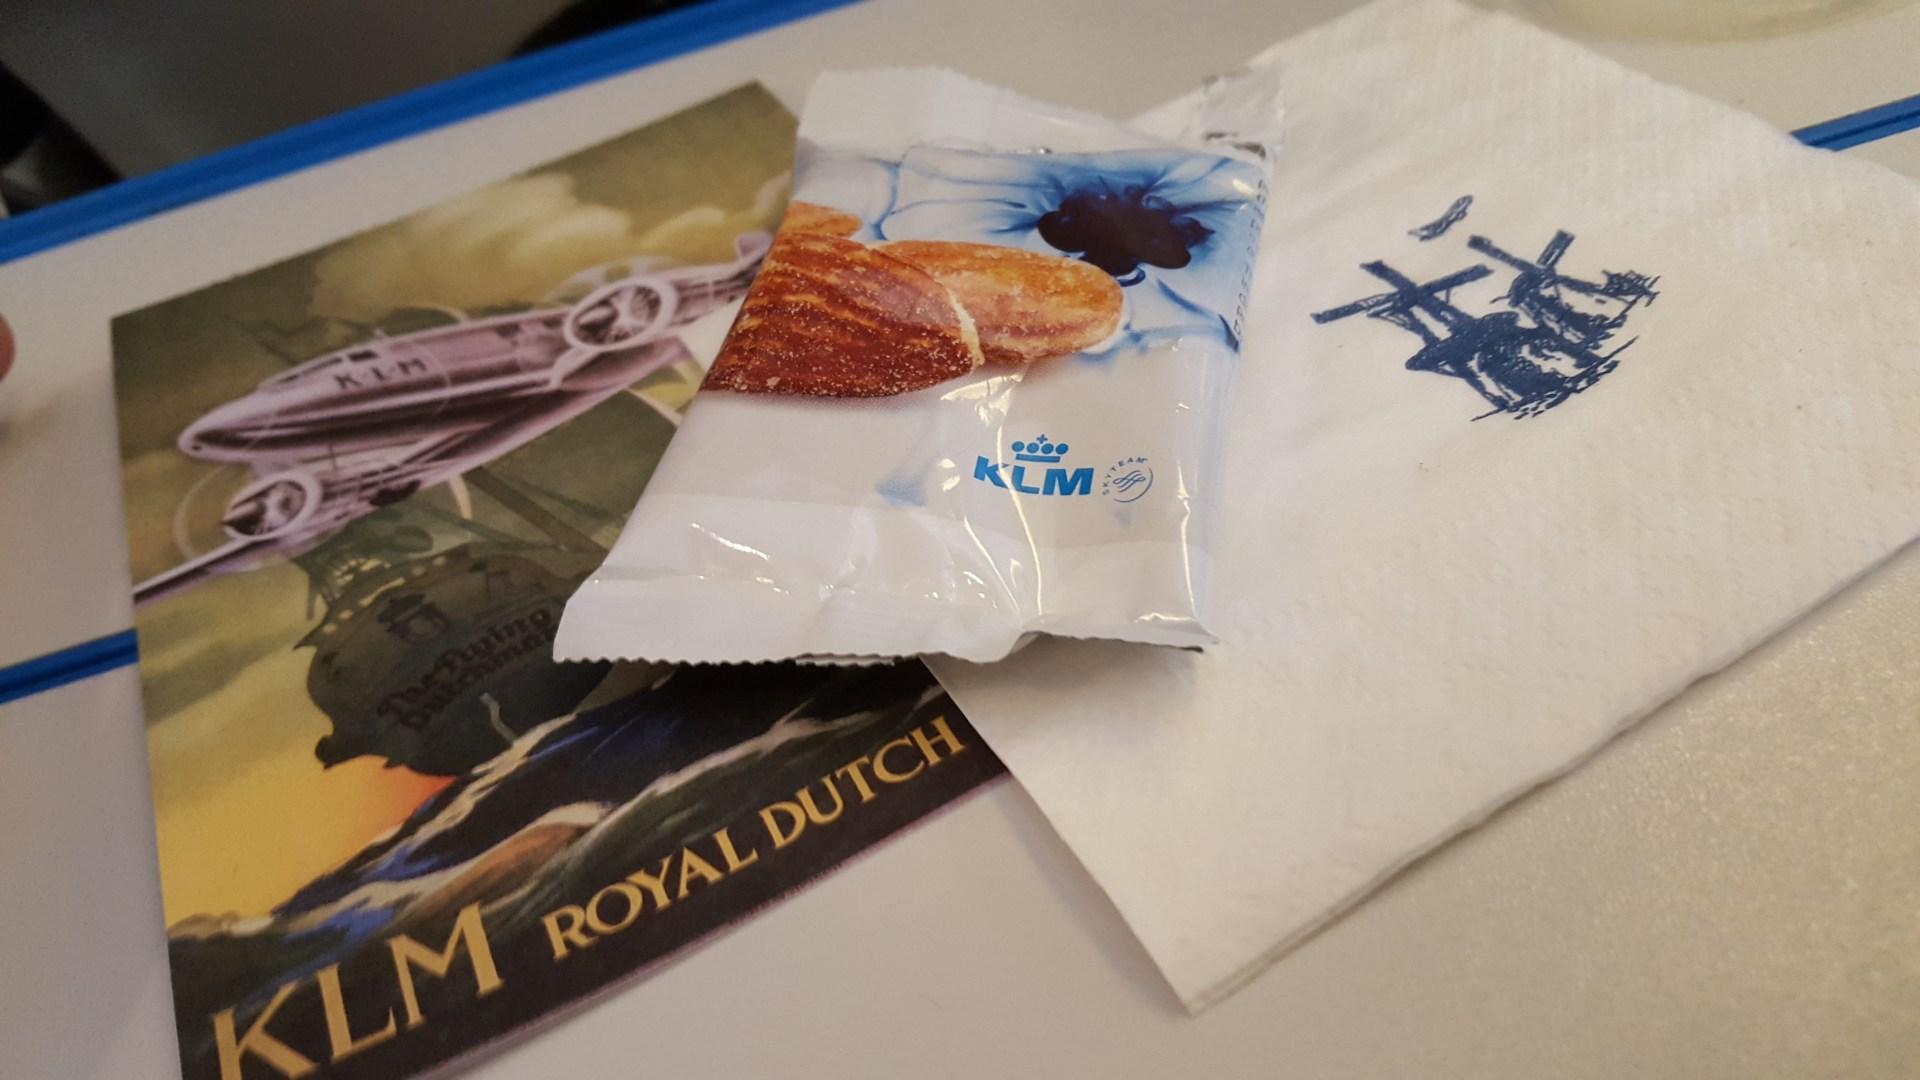 Brazilian menu at KLM flights: Sao Paulo – Amsterdam